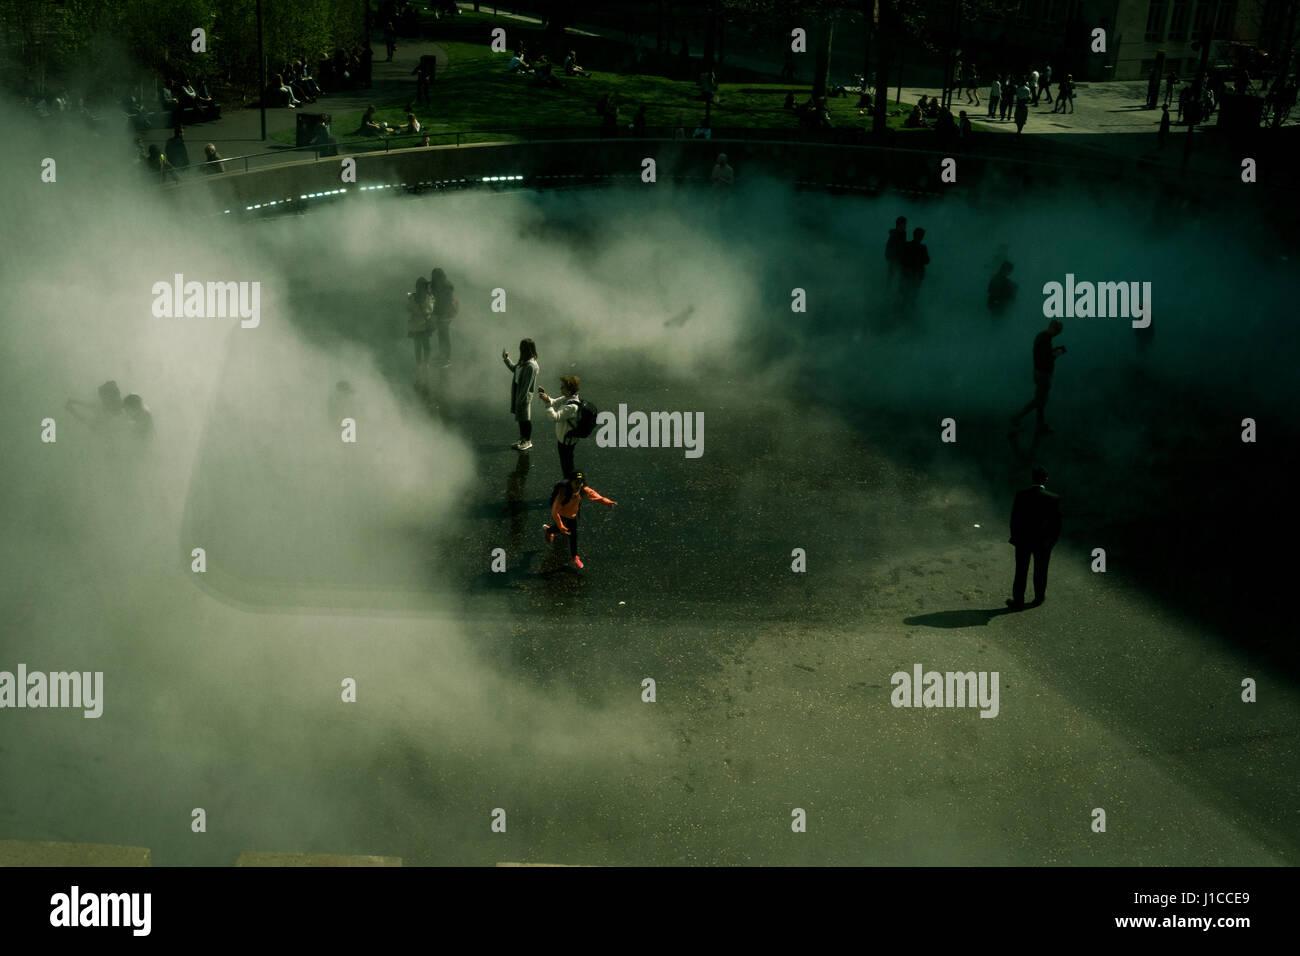 Fujiko Nakaya immersive fog sculpture at Tate Modern, London Stock Photo